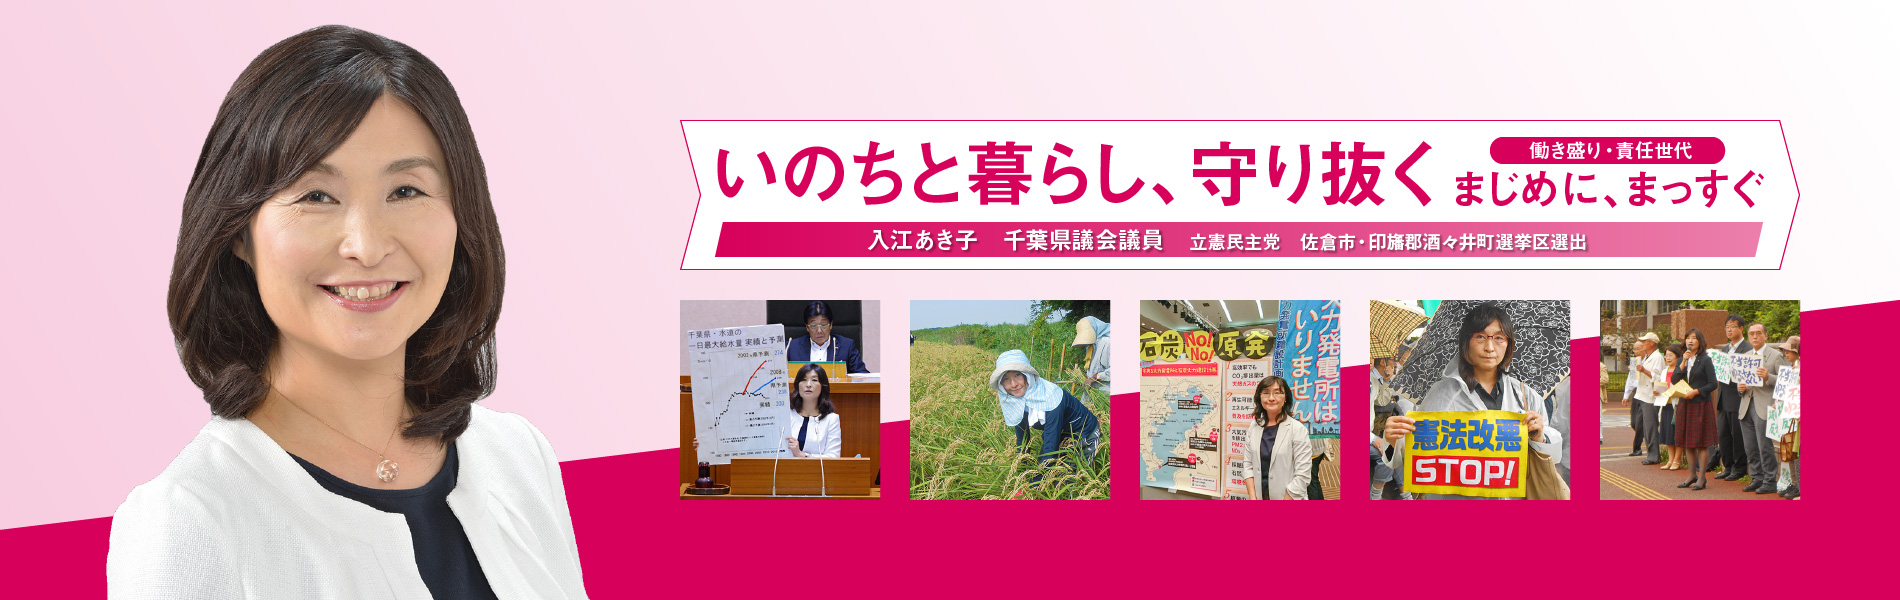 入江あき子 千葉県議会議員